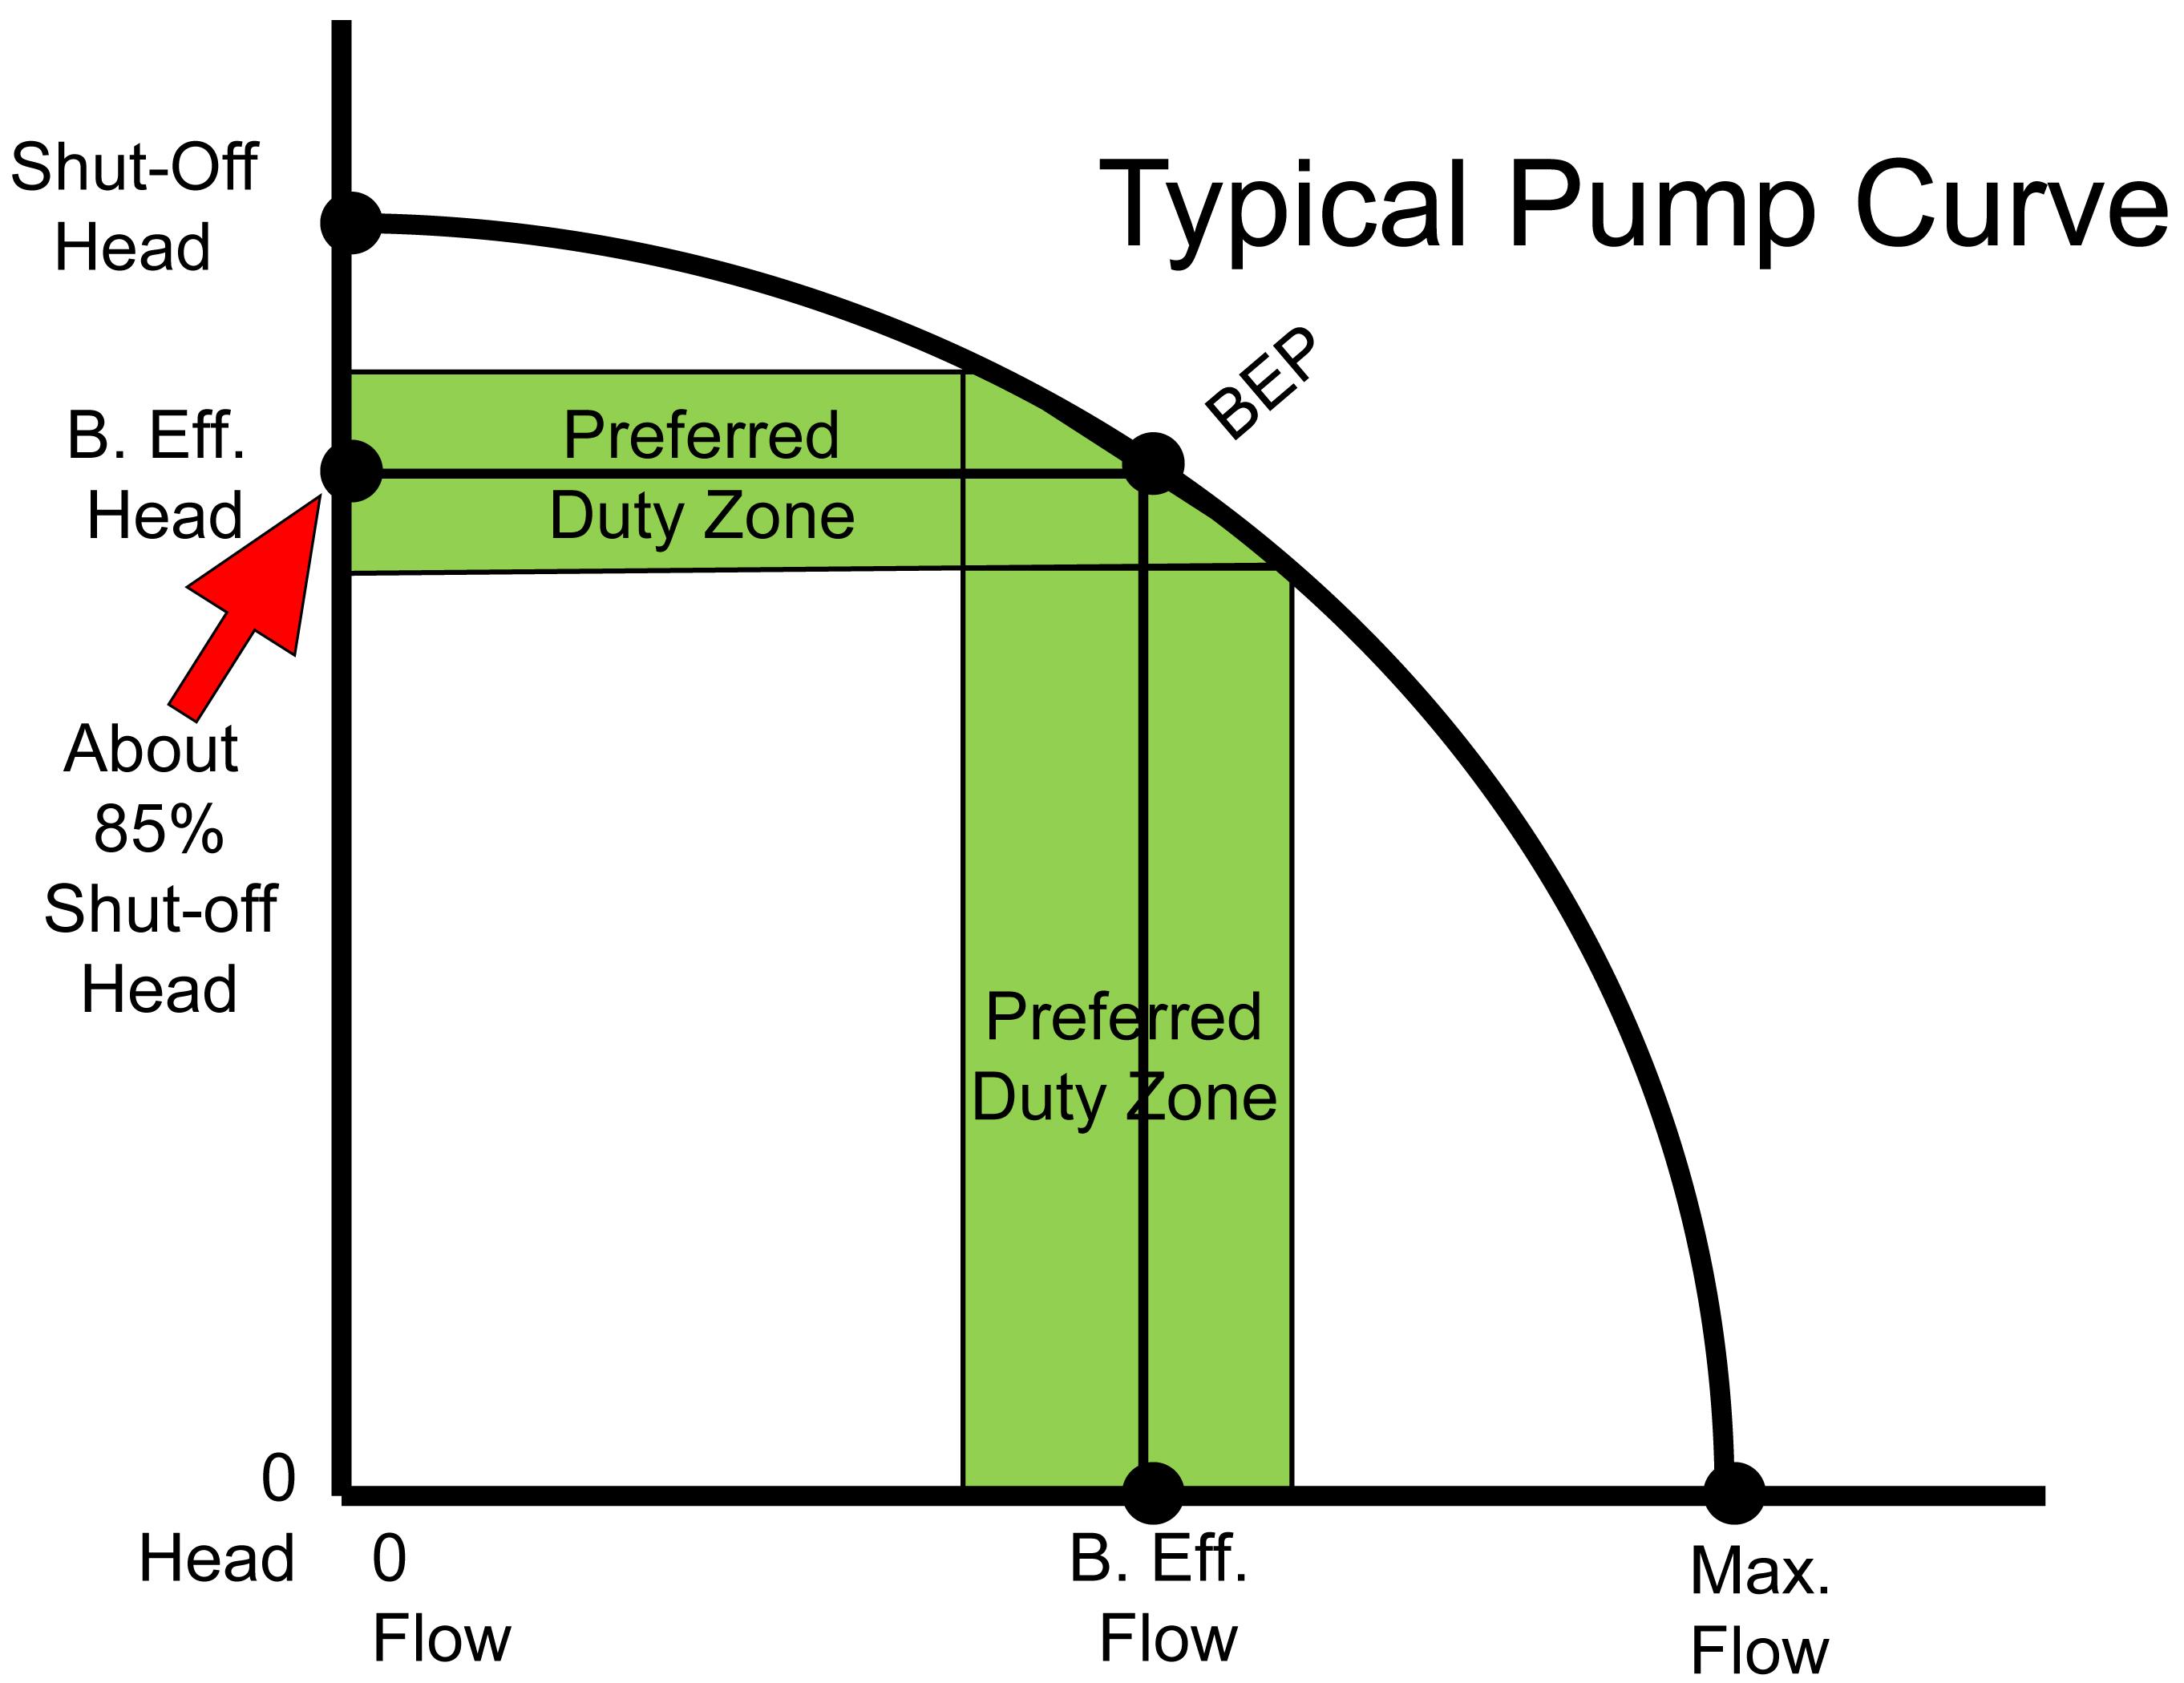 Typical Pump Curve